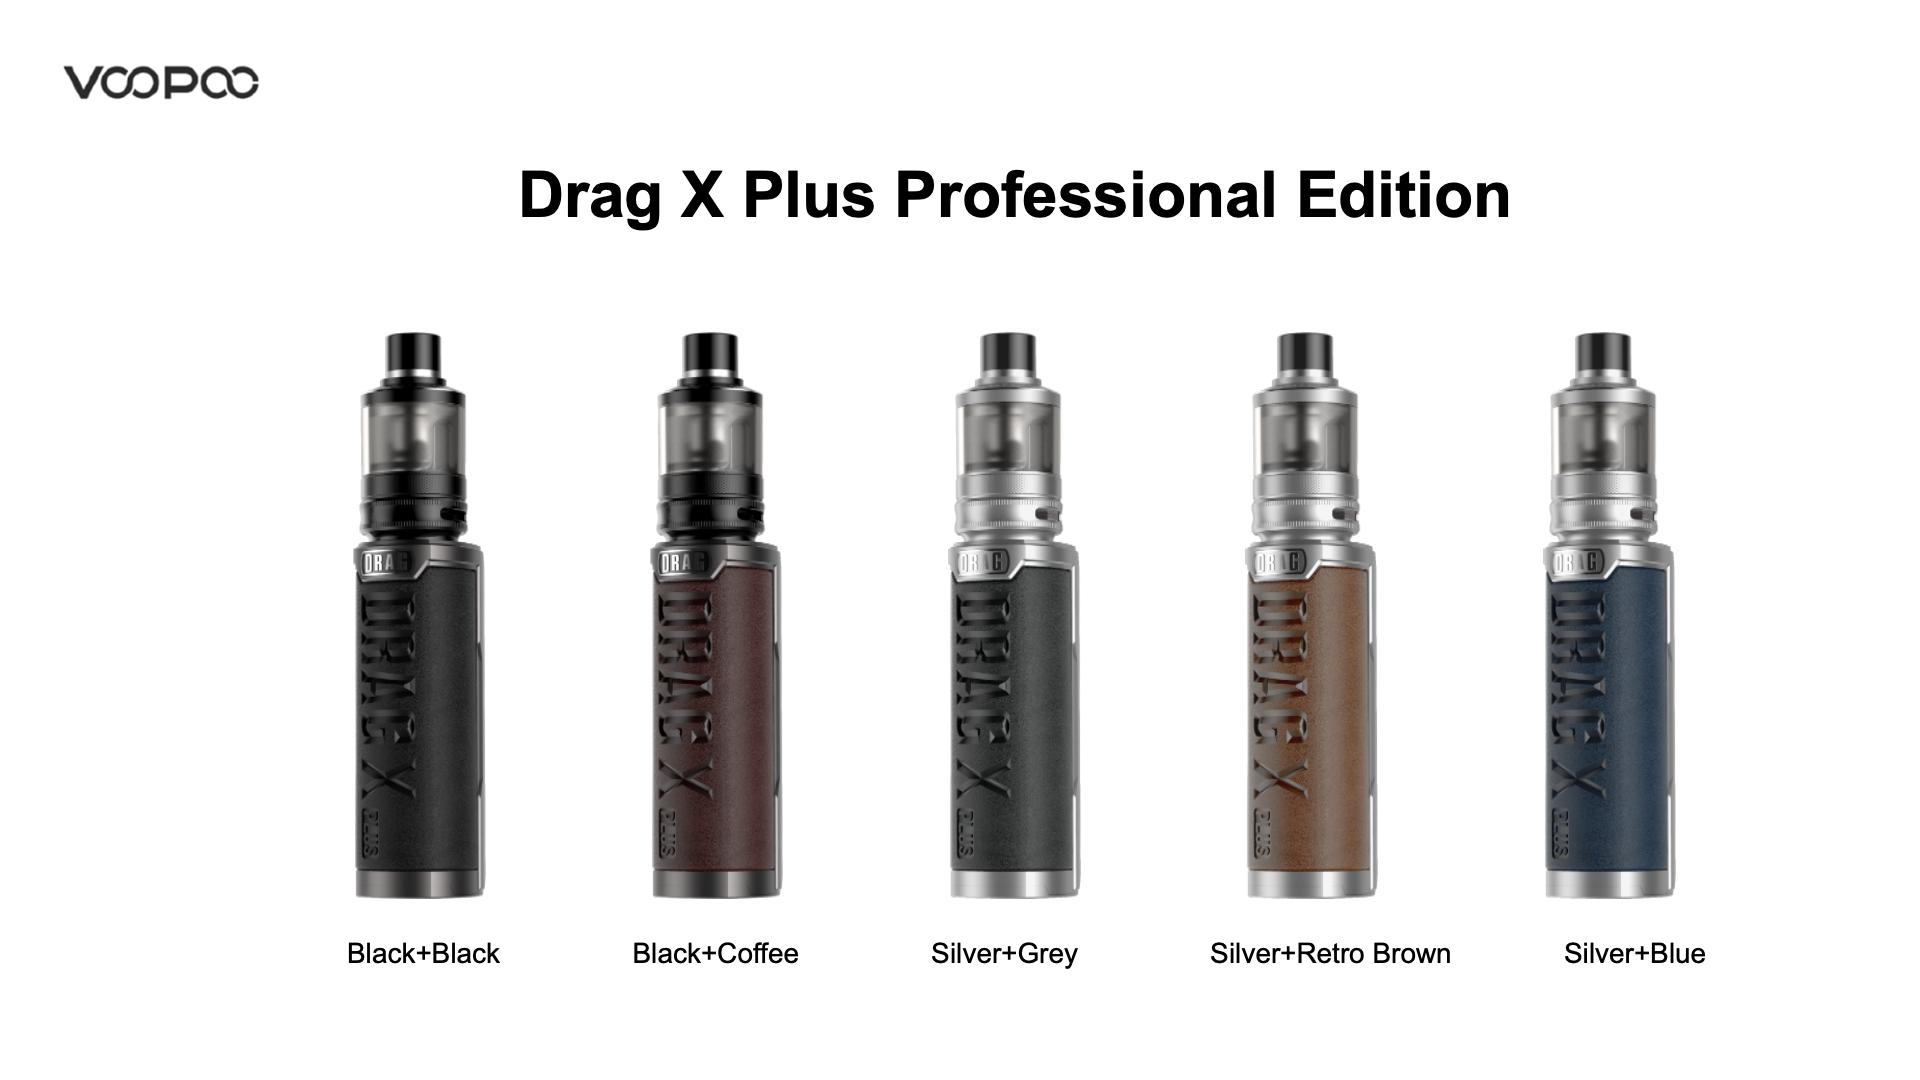 Drag X PlusPro - Voopoo vapori vape shop